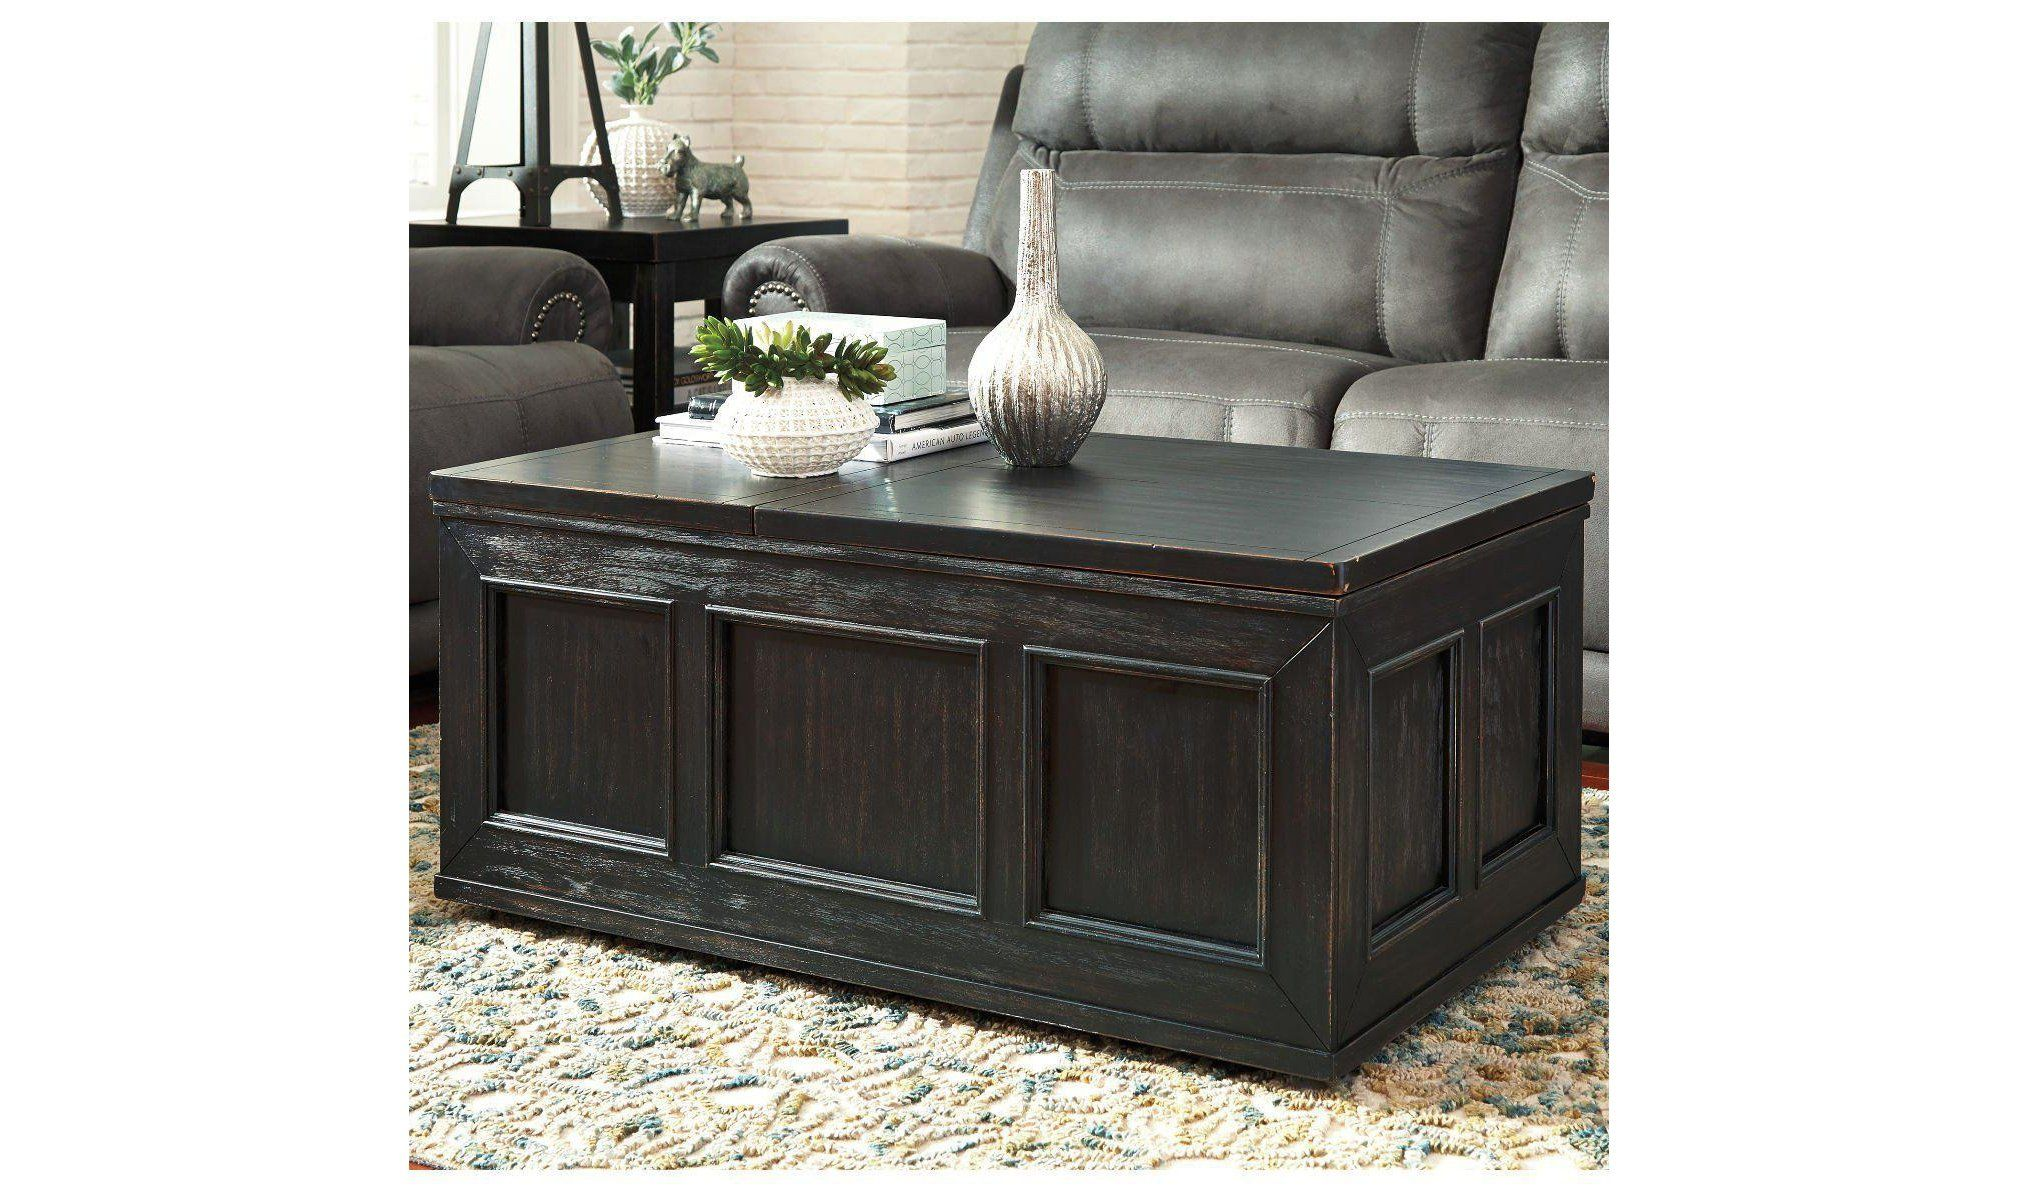 Gavelston Lift Top Coffee Table Coffee Table Coffee Table With Storage Lift Top Coffee Table [ 1200 x 2018 Pixel ]